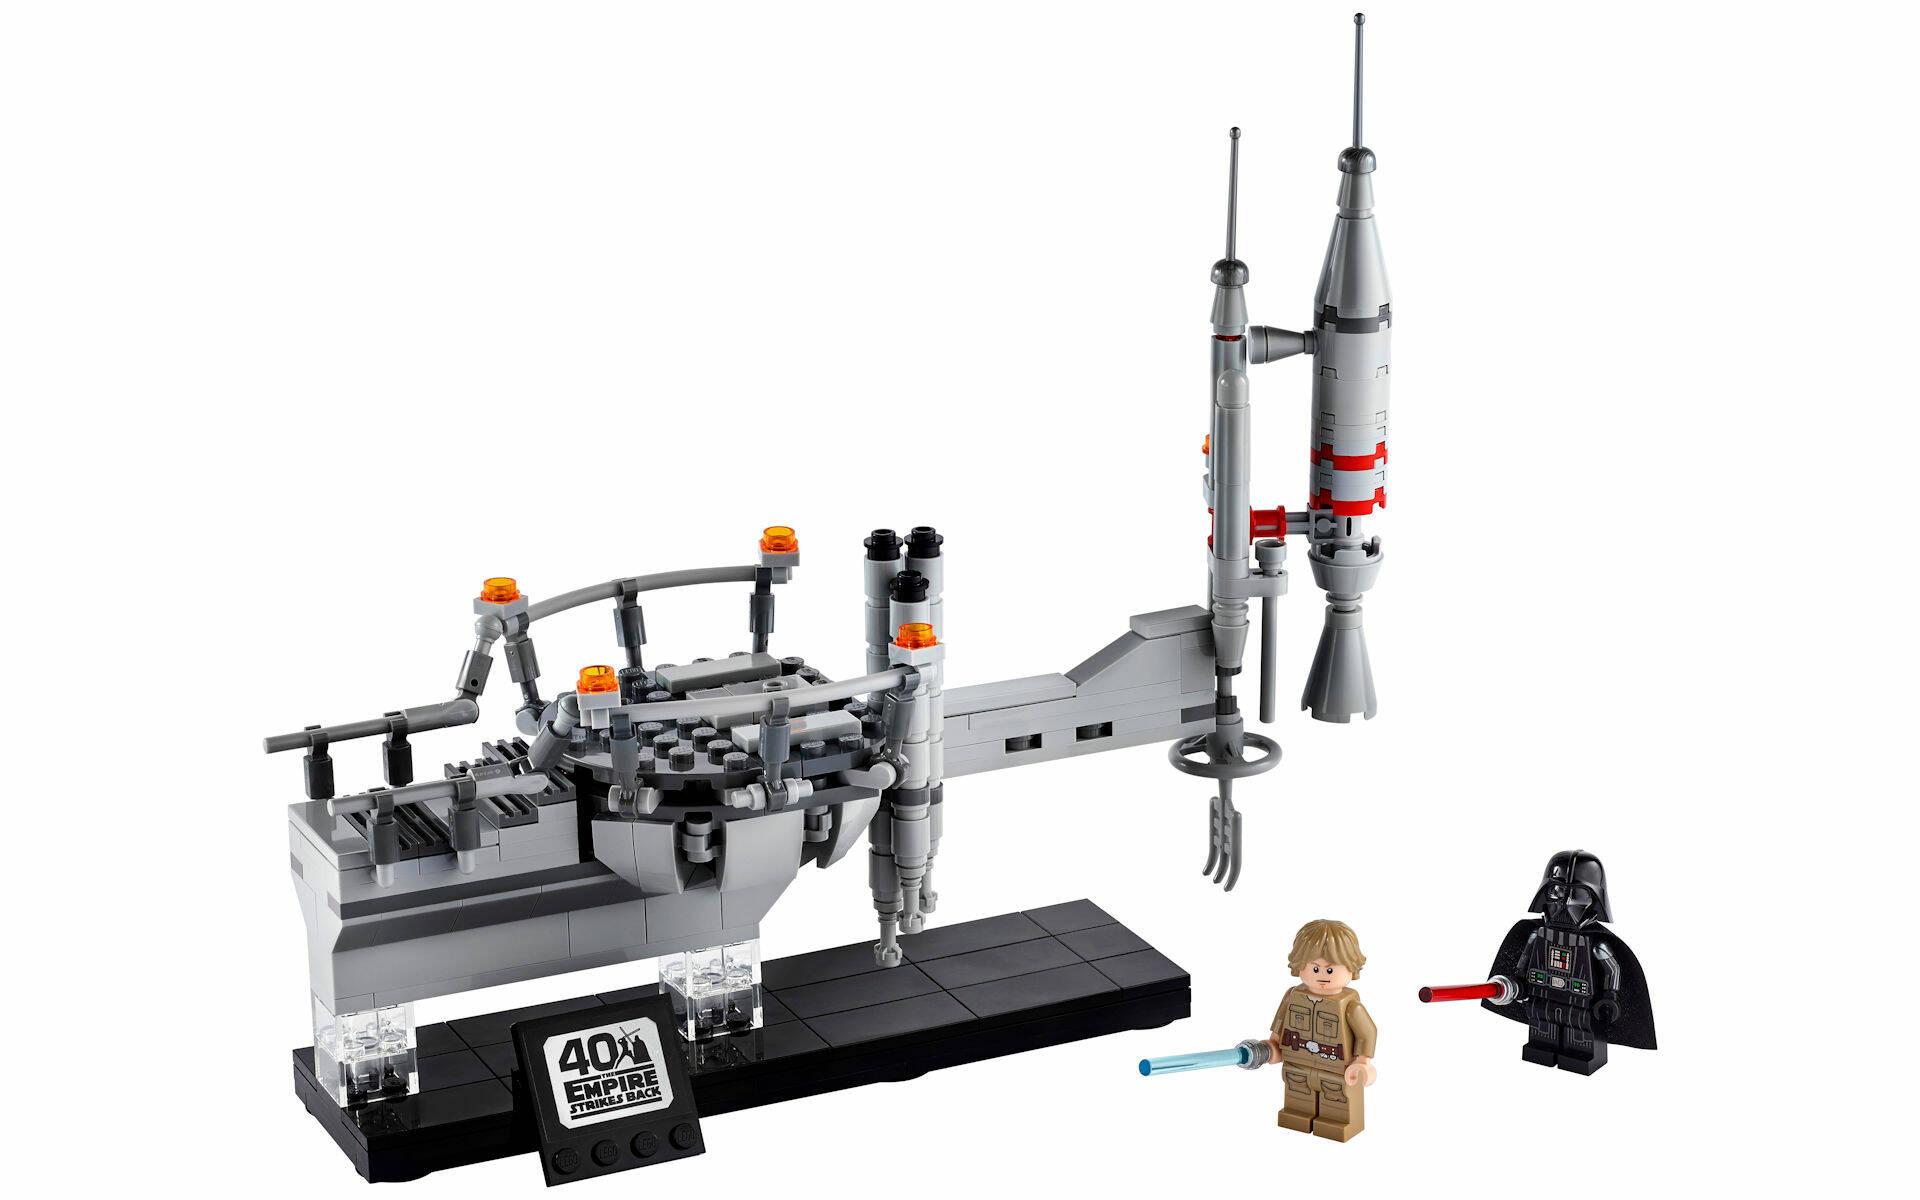 LEGO STAR WARS DUELLO DI BESPIN